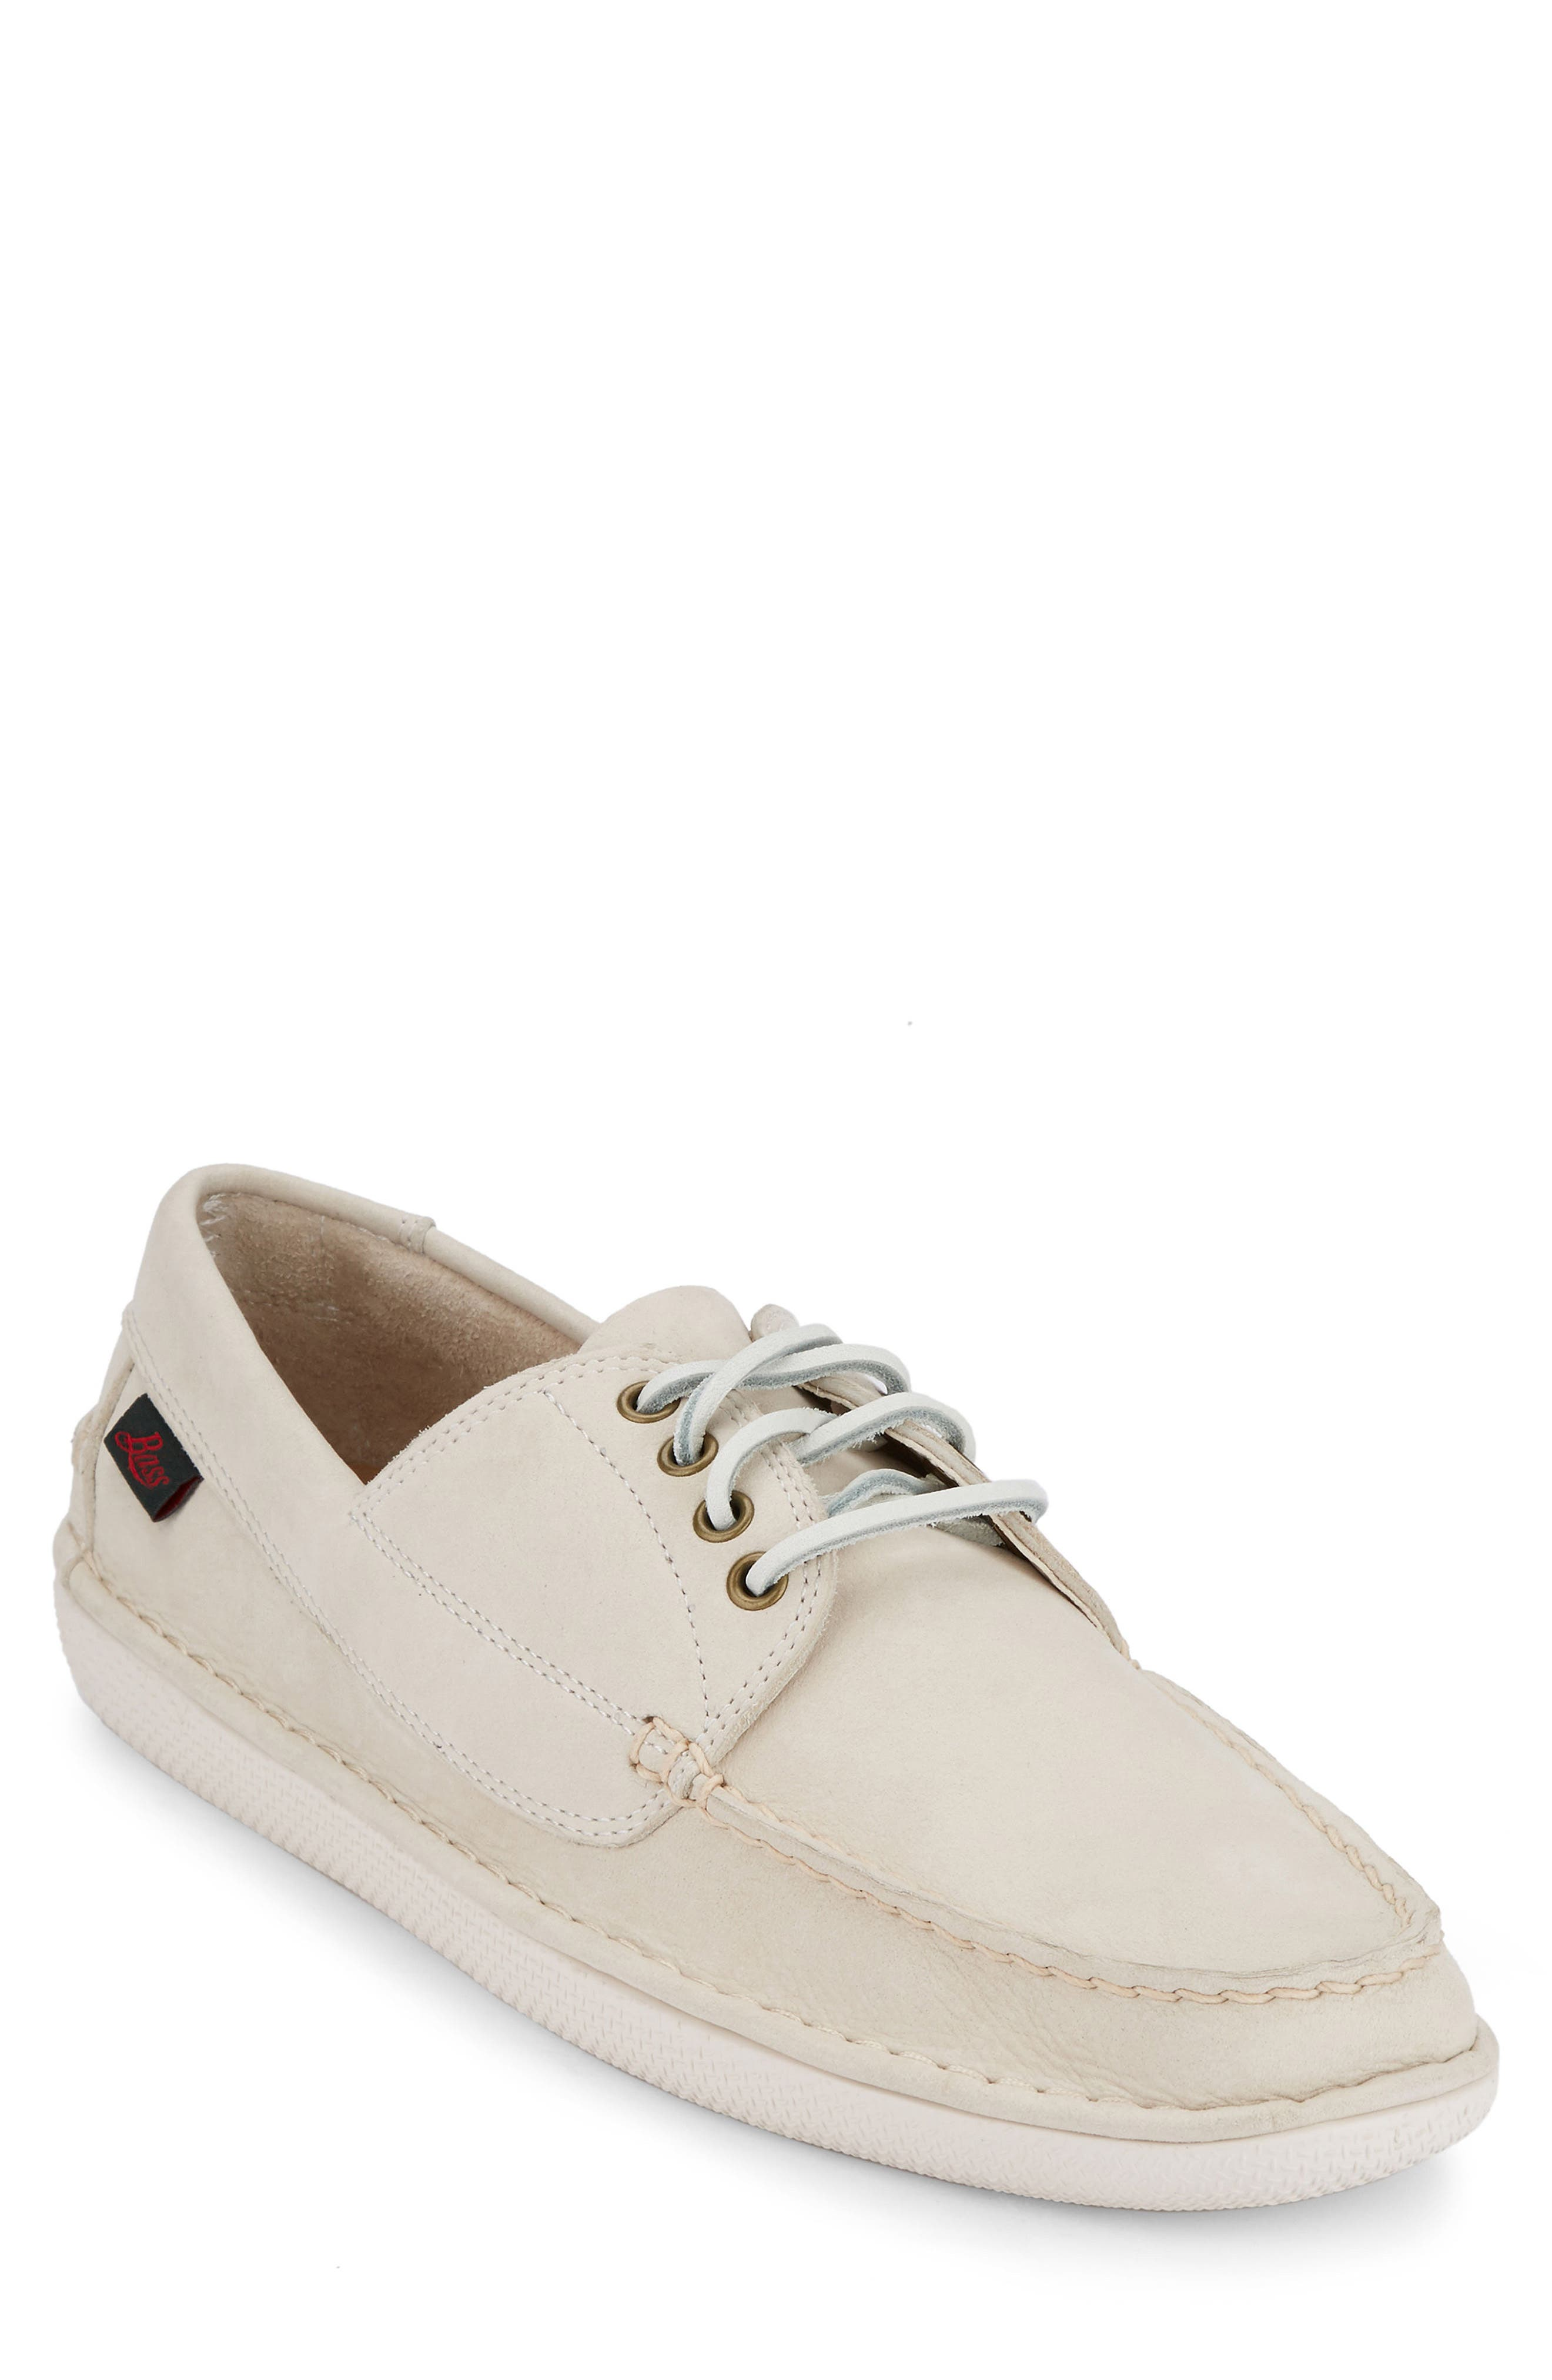 G.H. Bass & Co. Whitford Boat Shoe (Men)